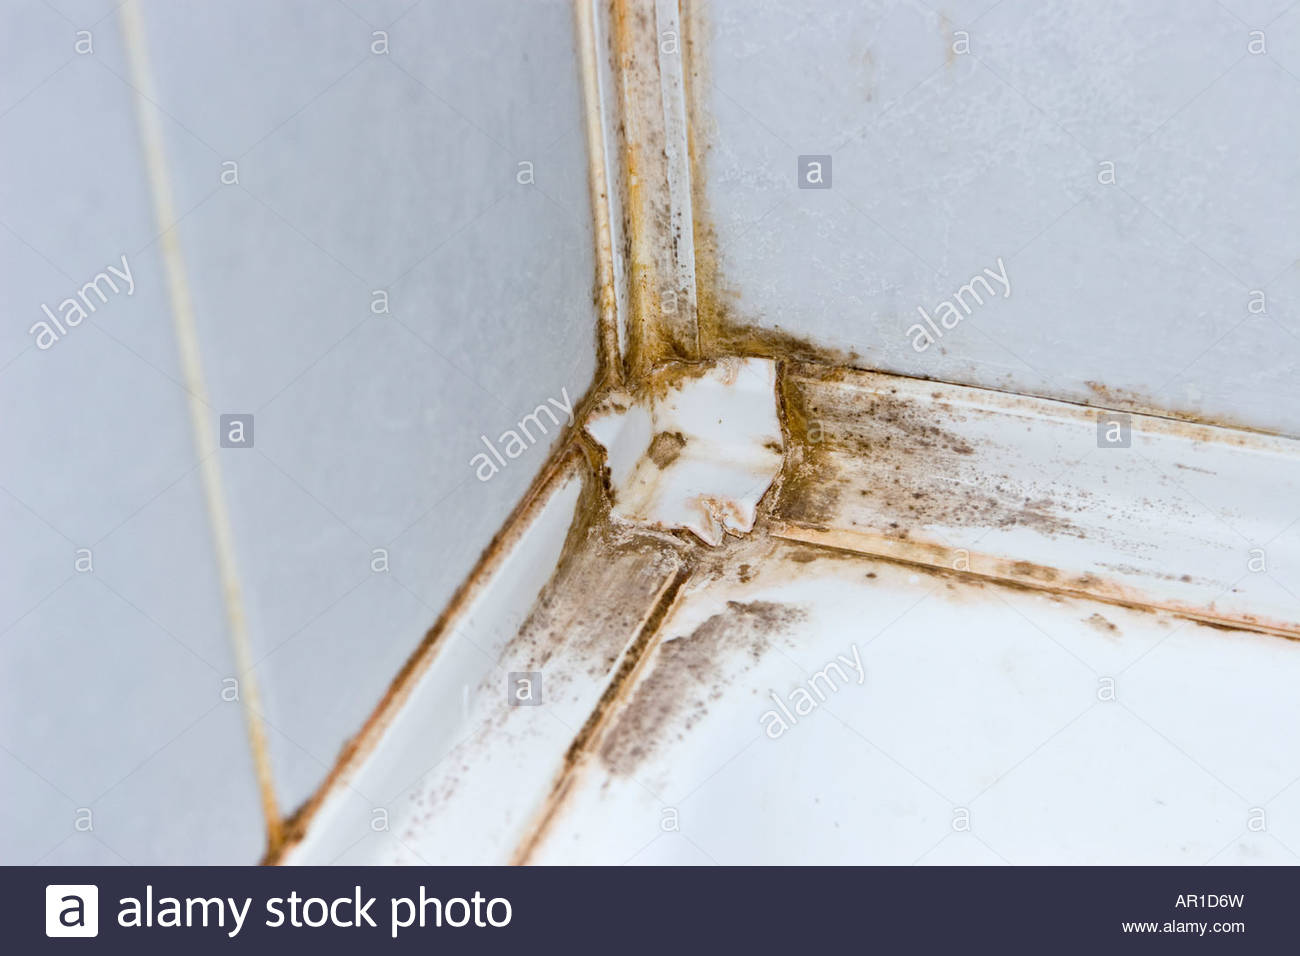 Dirty bath shower seal. - Stock Image